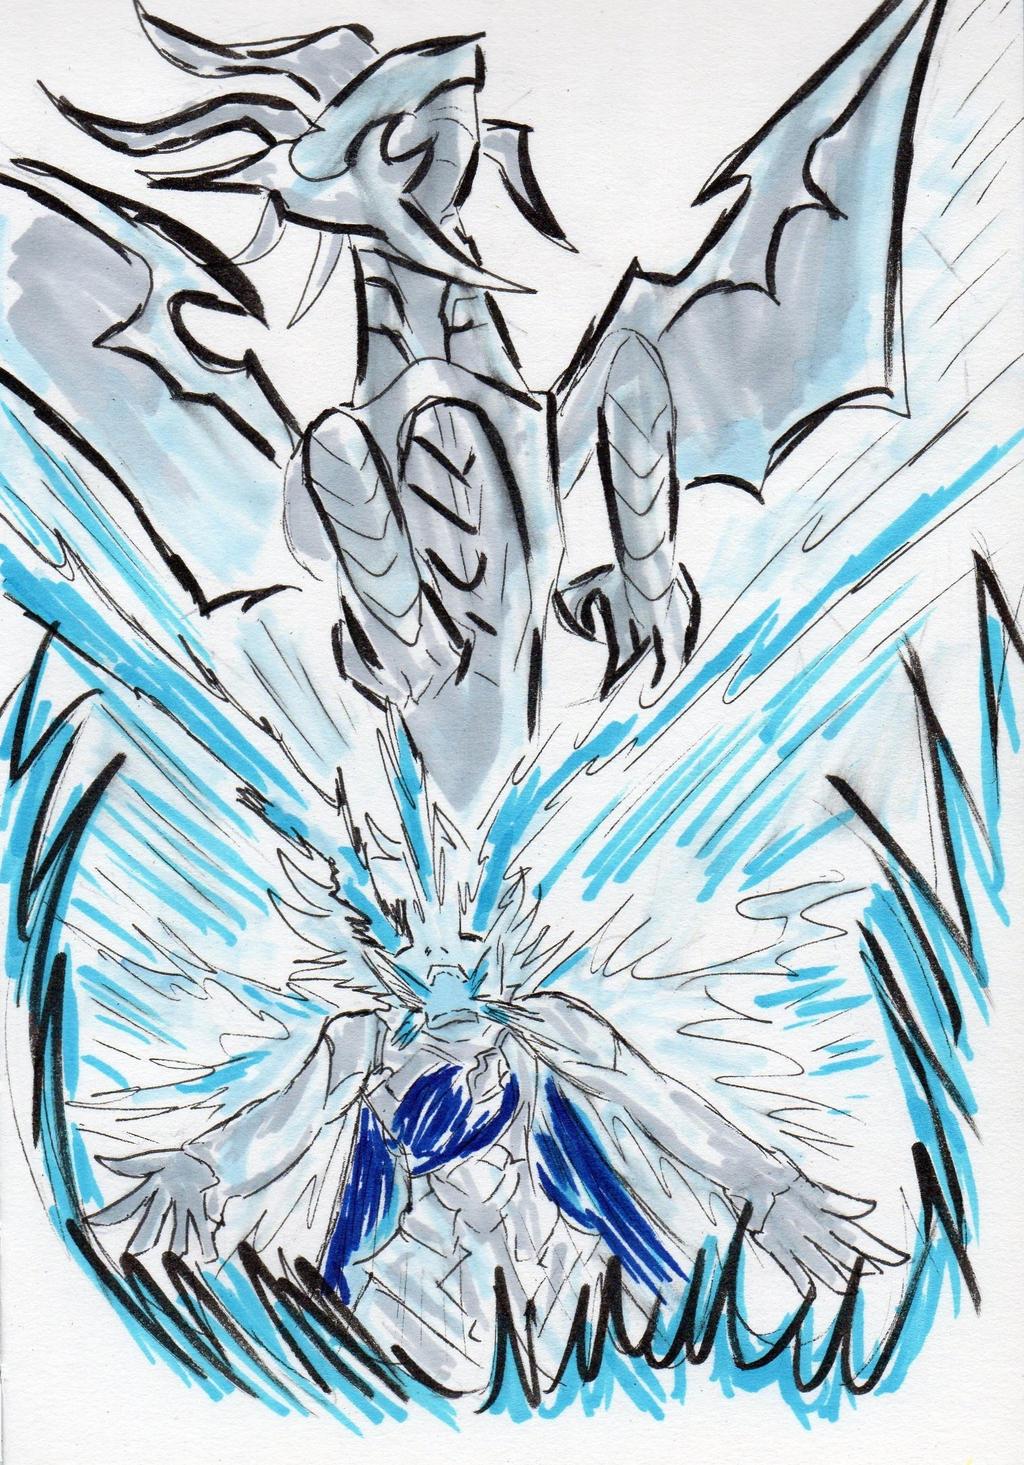 Kamui's Dragon Transformation by ironherc on DeviantArt